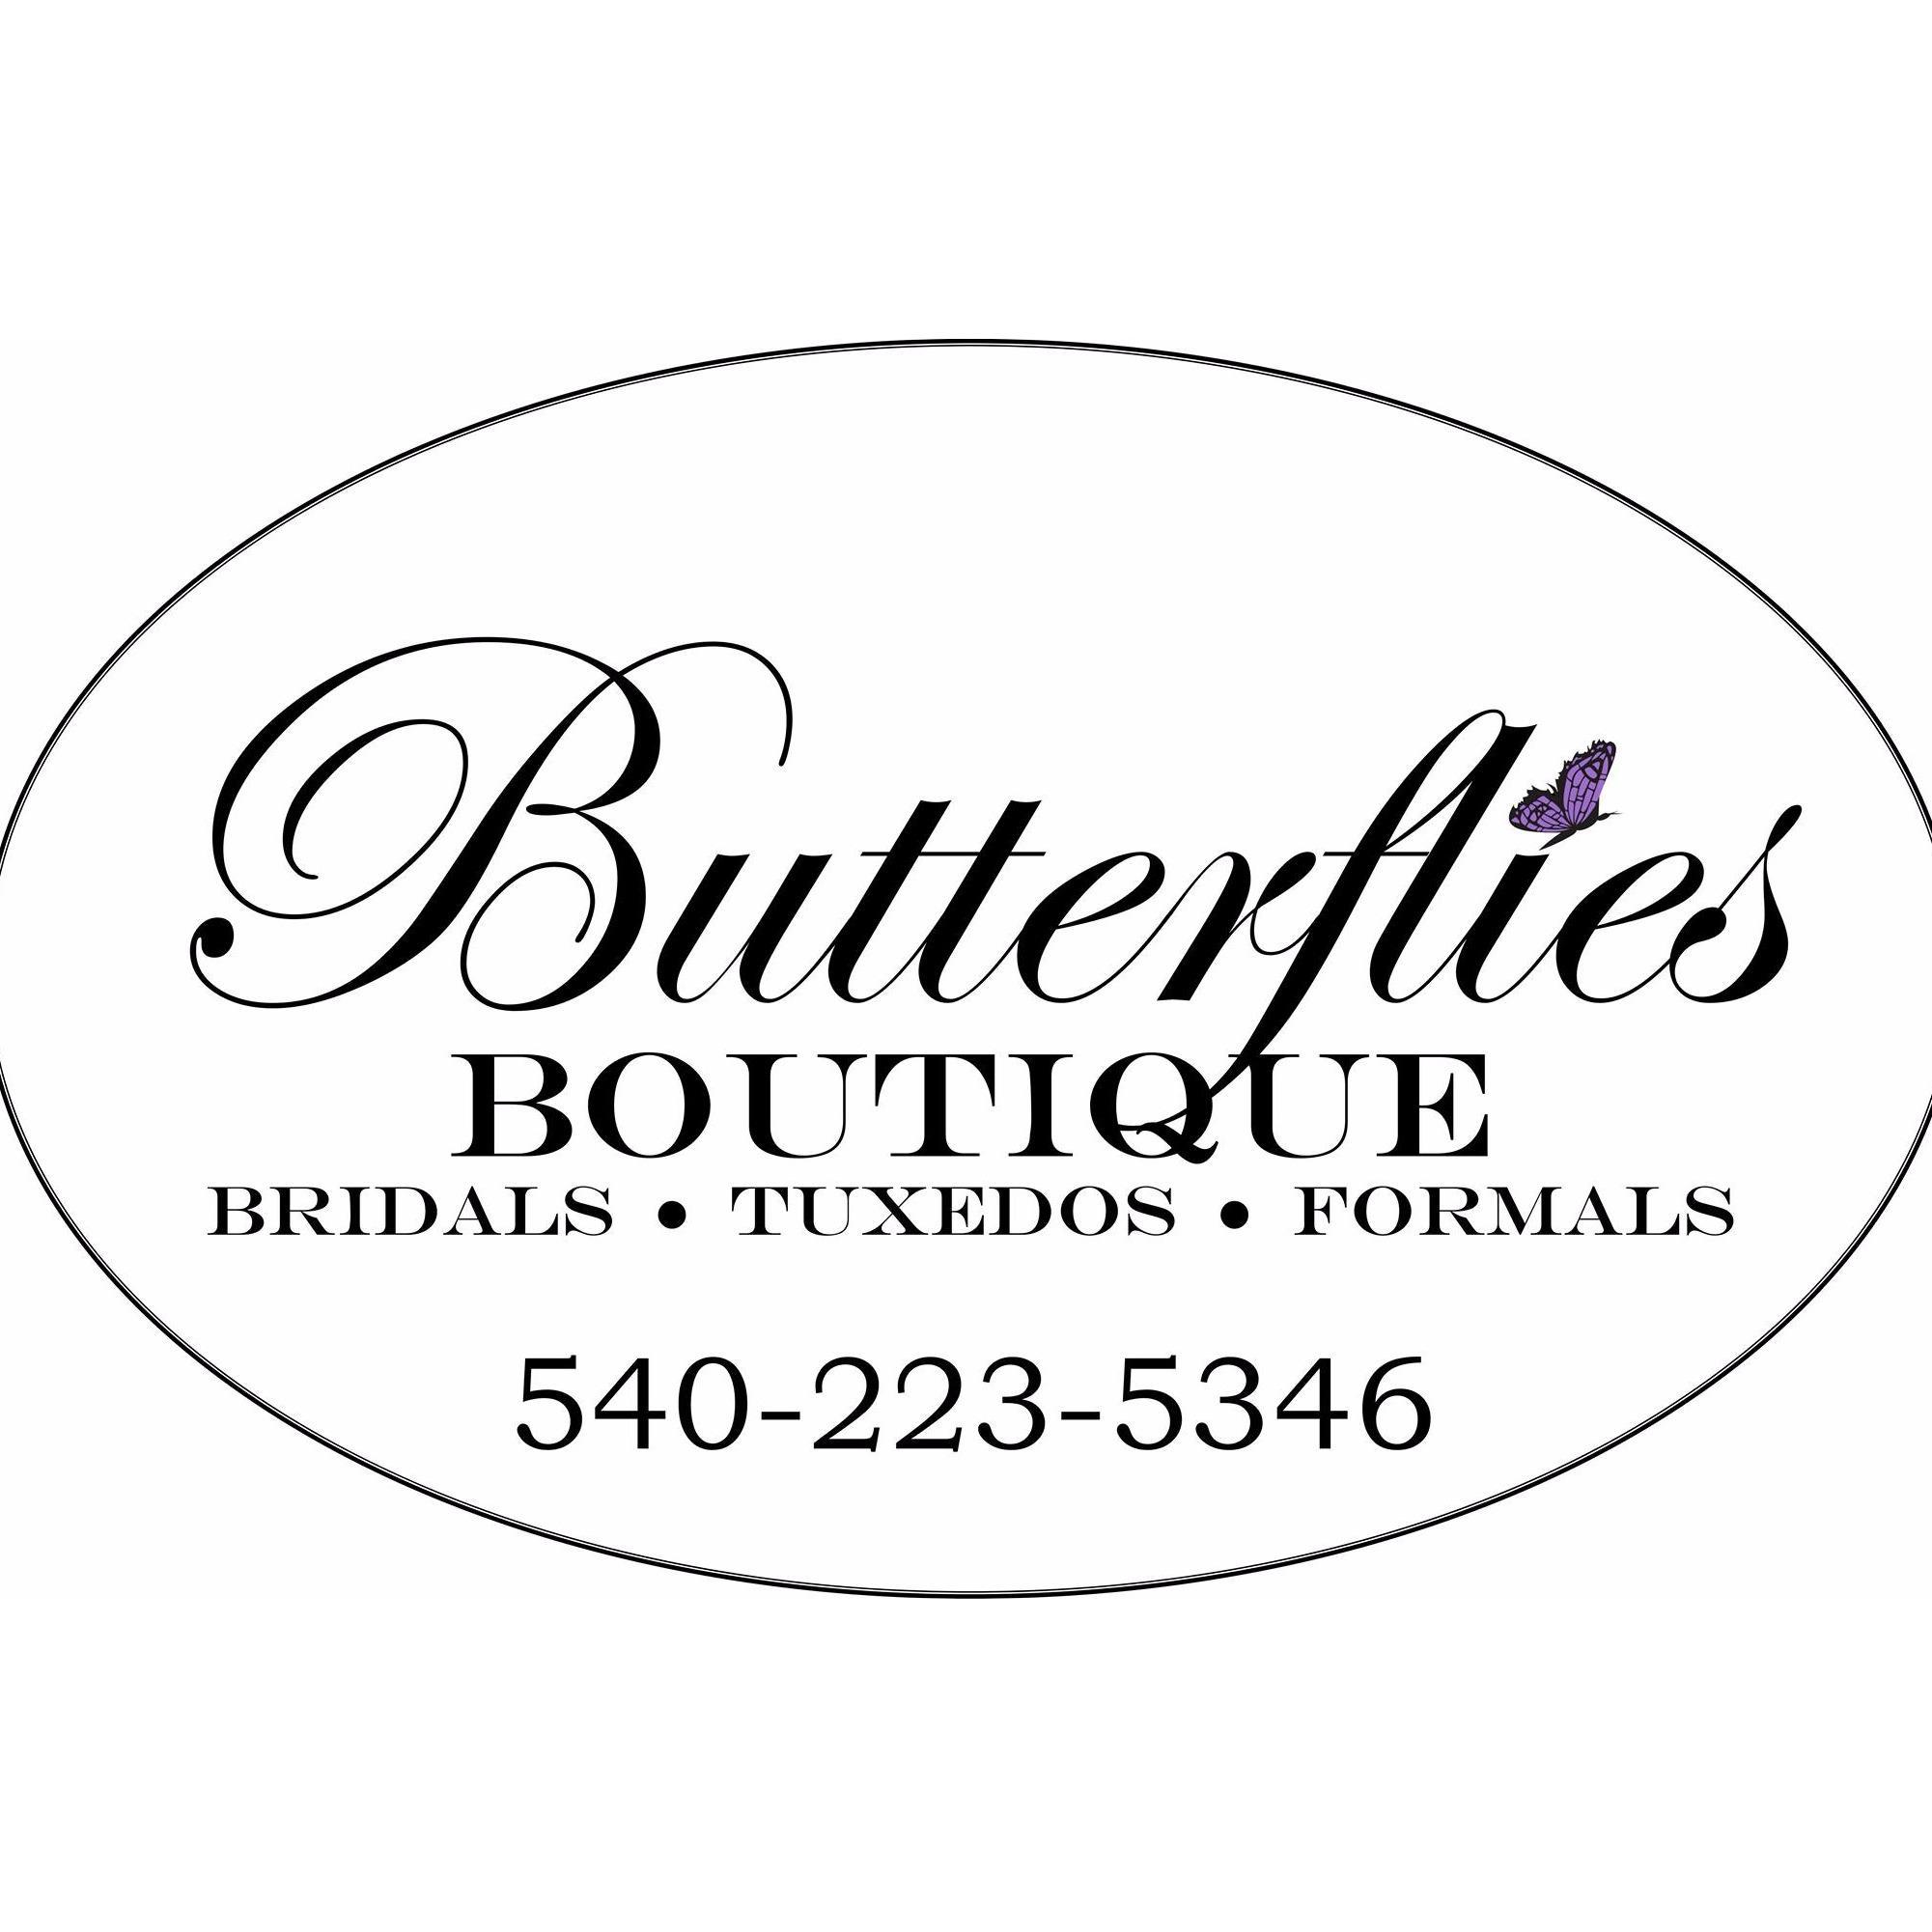 The Butterflies Boutique image 6